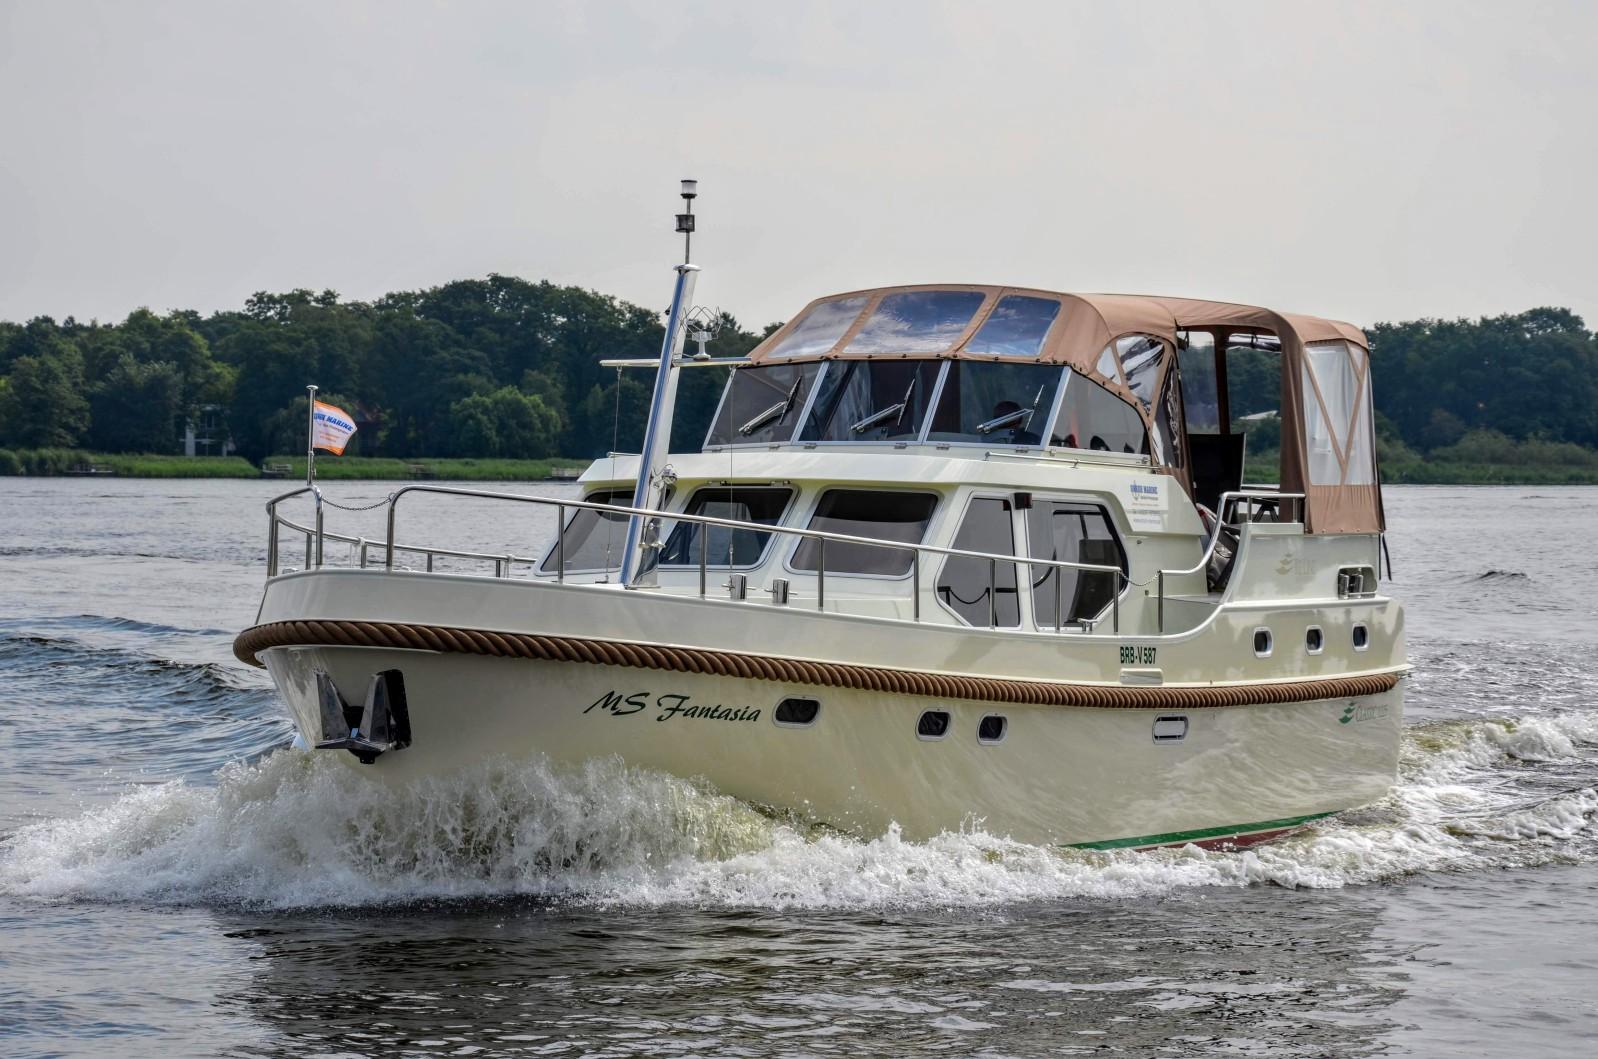 Yachtcharter Anklam